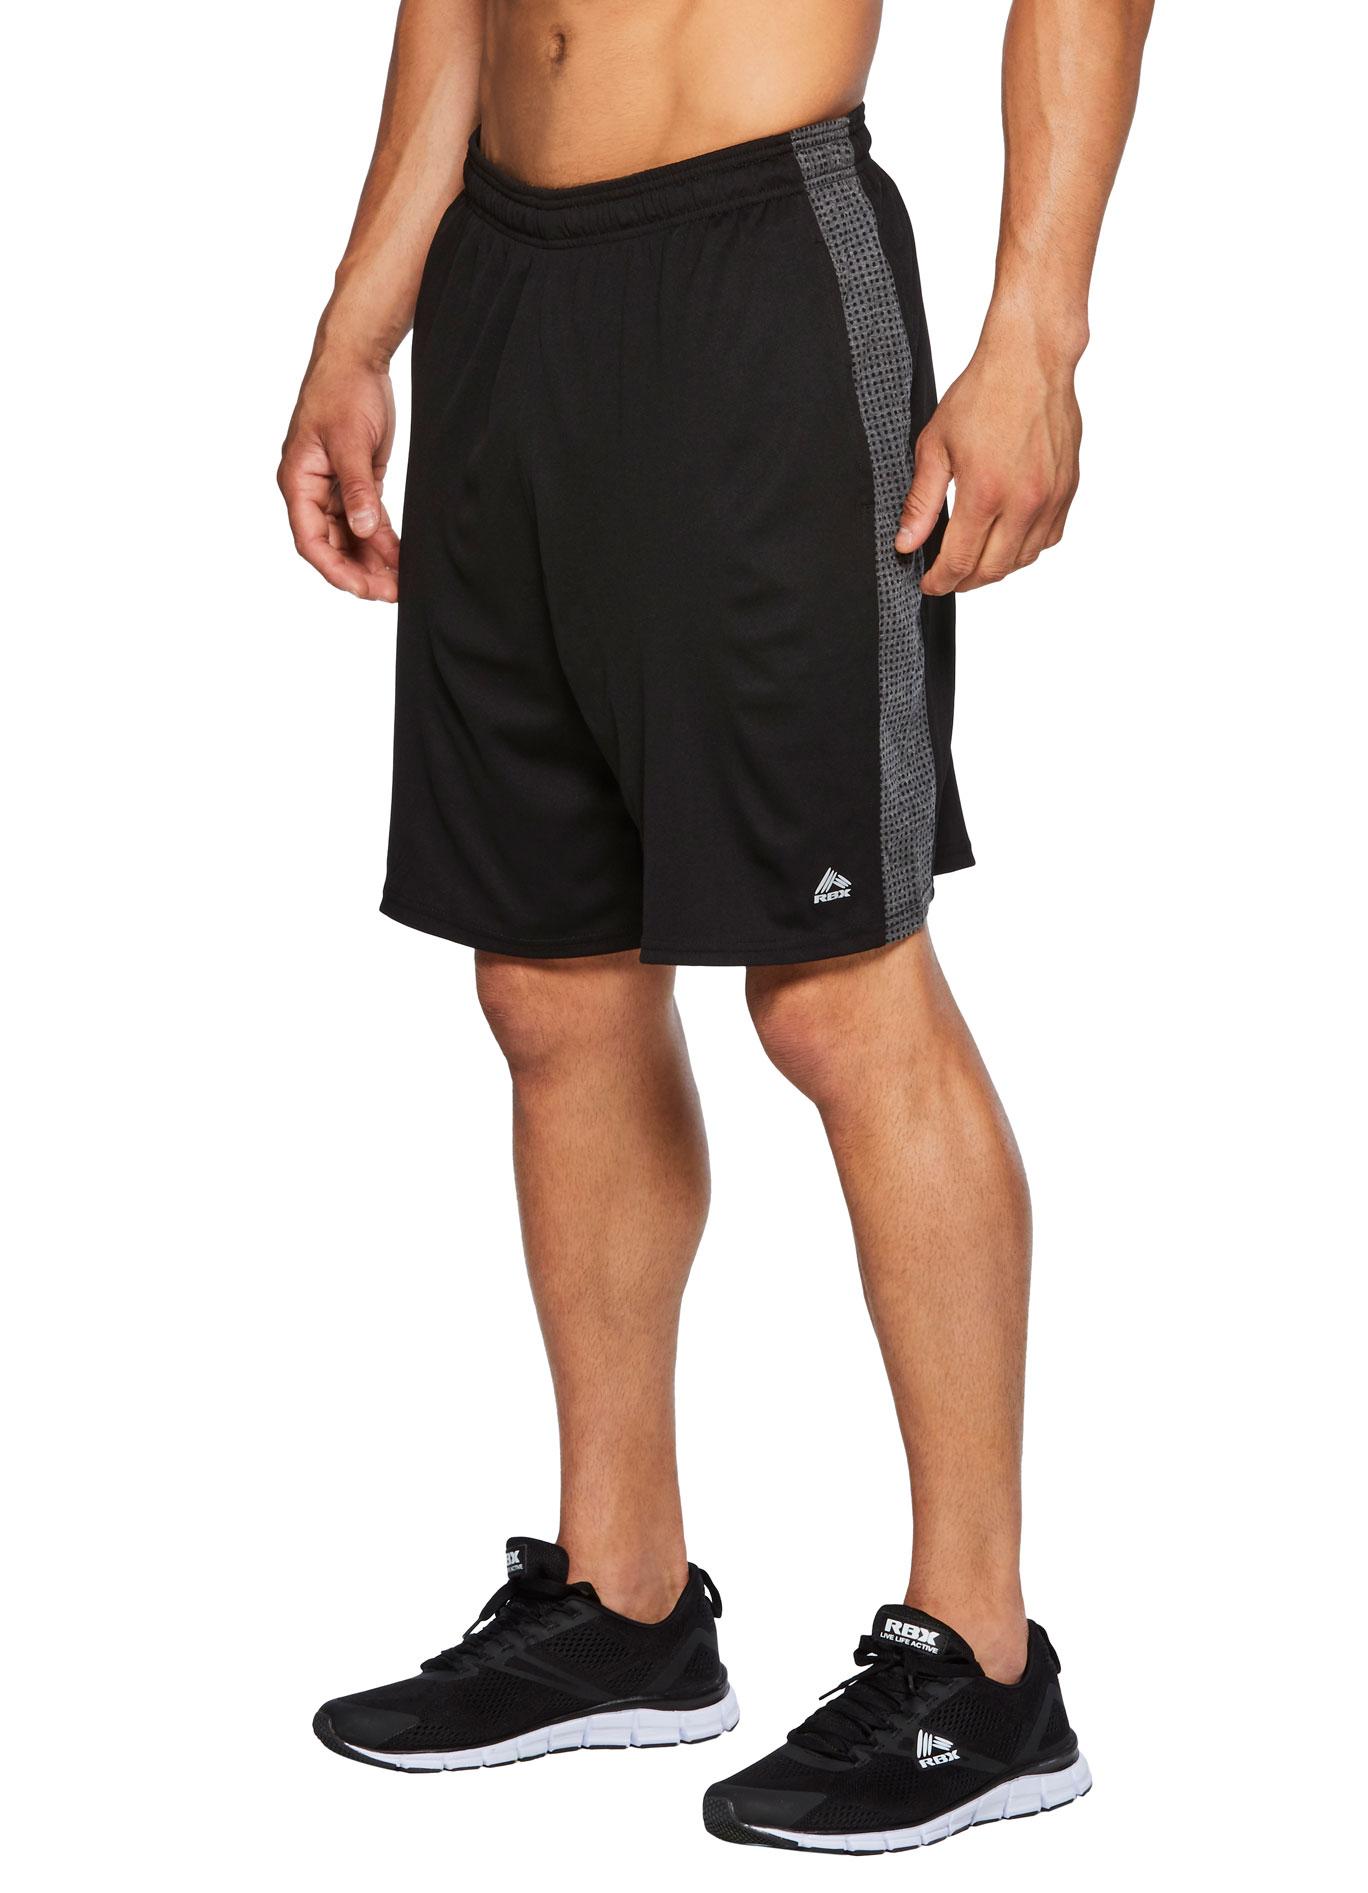 RBX Active Men's Novelty Mesh Gym Shorts w/Pockets